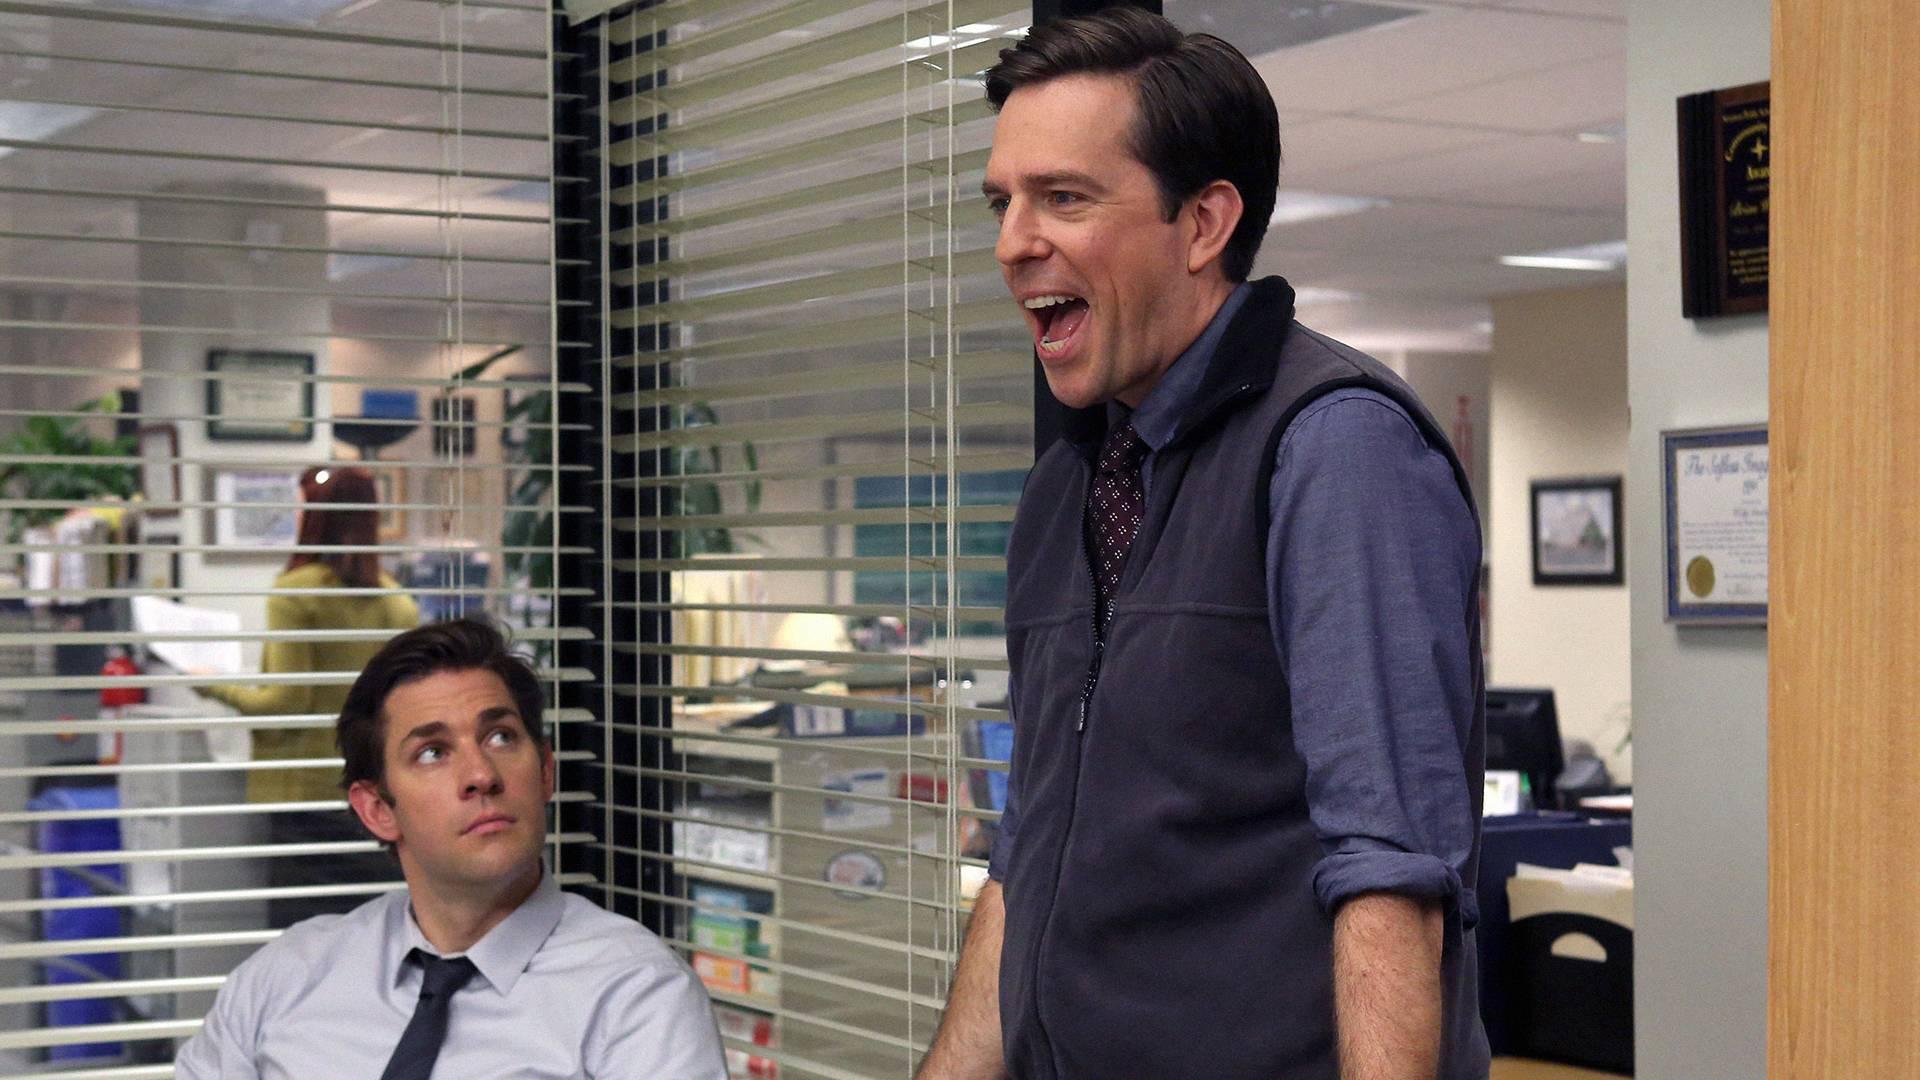 The Office Season 9 Episode 3